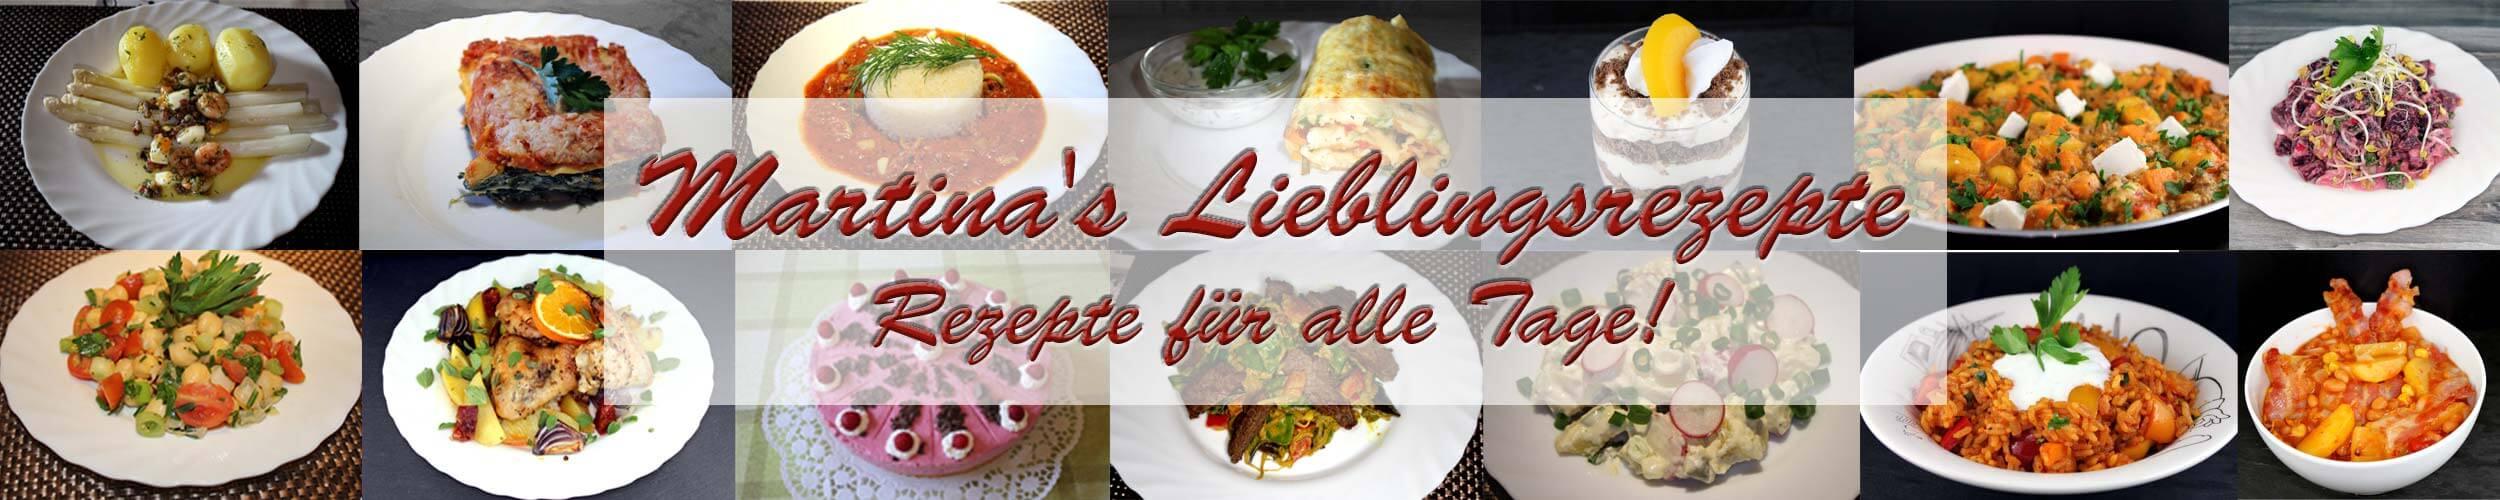 Martinas-Lieblingsrezepte - Rezepte für alle Tage! www.martinas-lieblingsrezepte.de